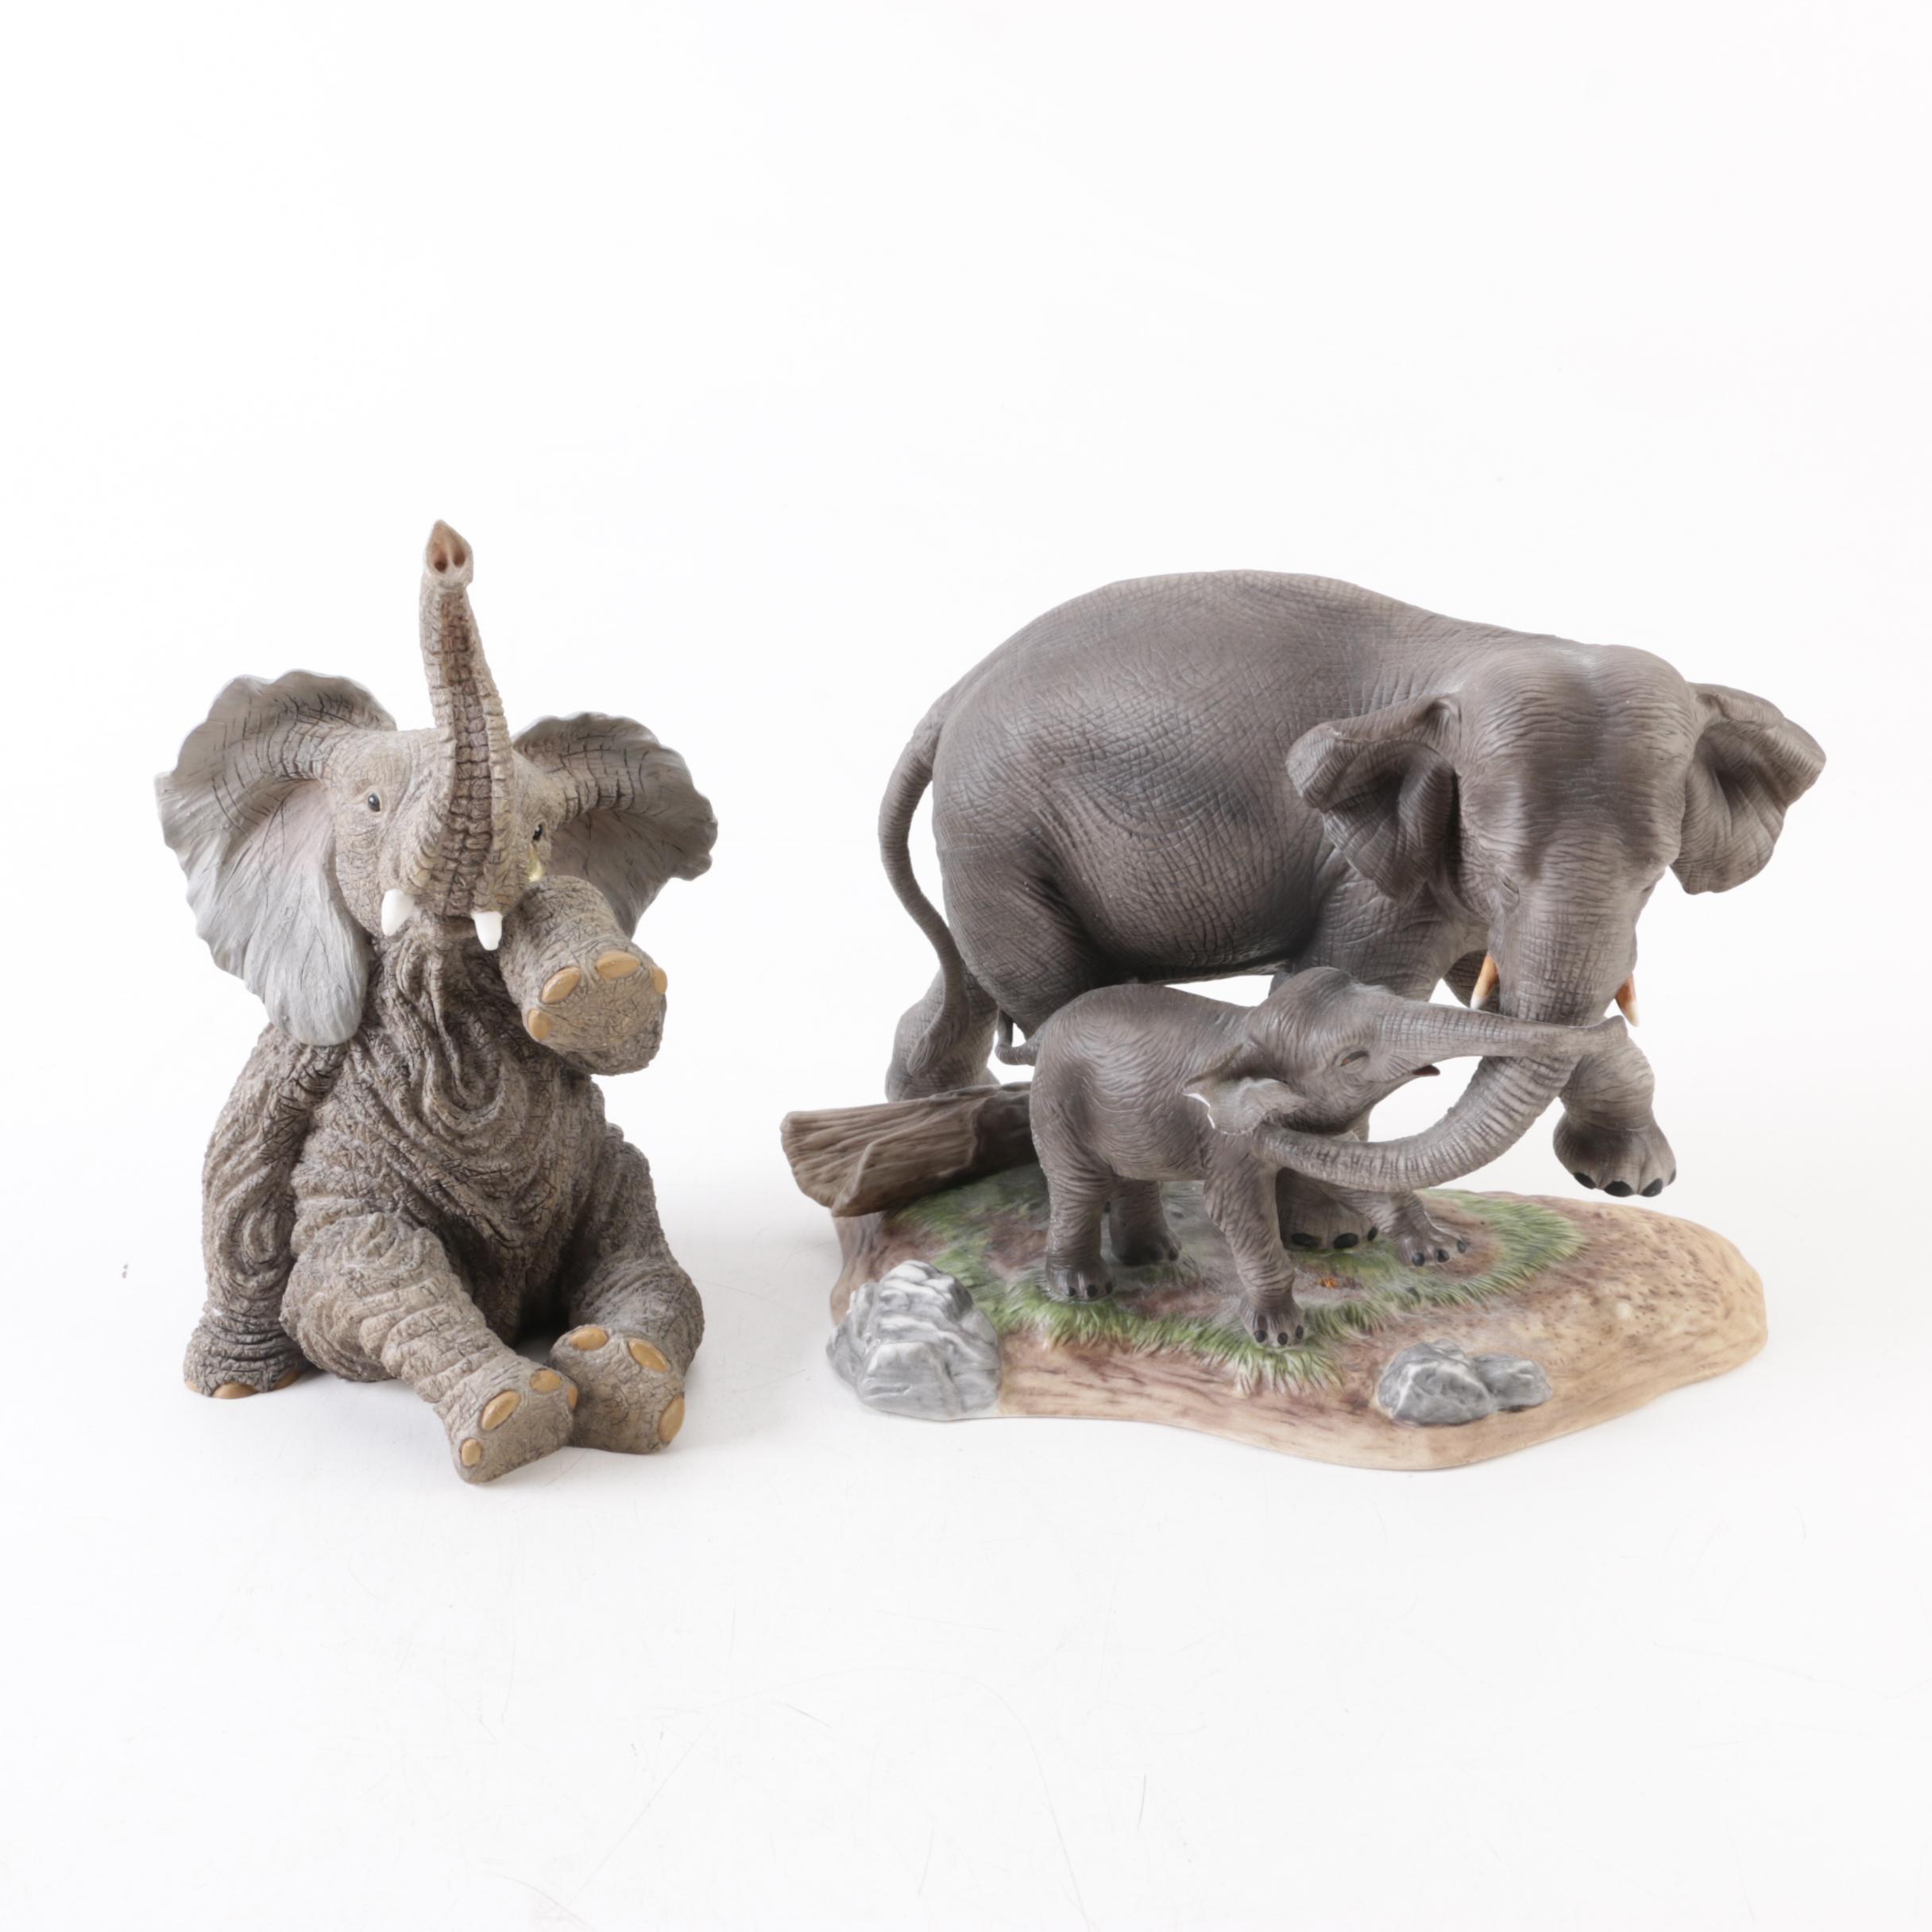 Lenox Porcelain Elephant Figurines ...